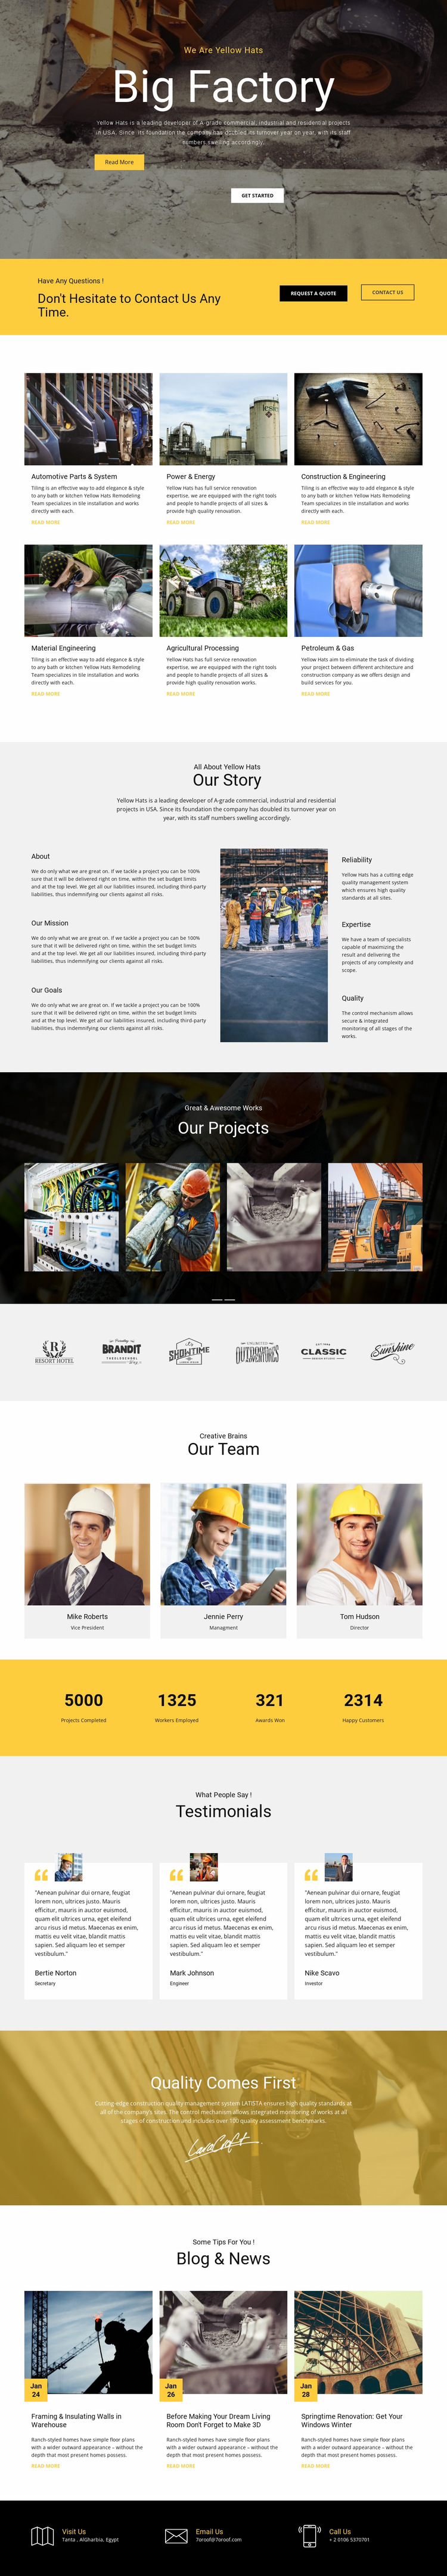 Factory works industrial Website Builder